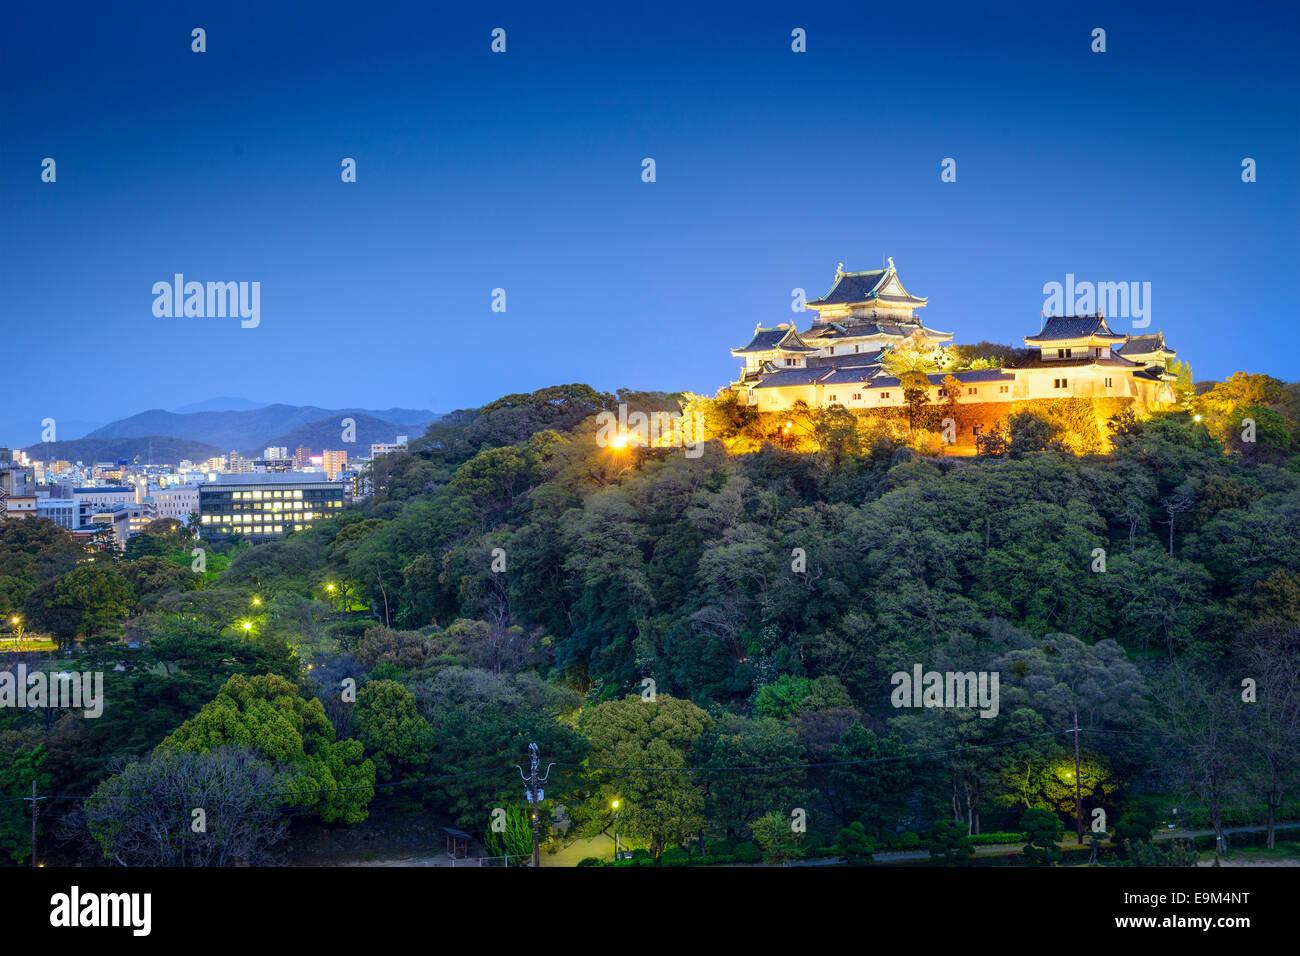 Stadt Wakayama, Japan auf Burg Wakayama. Stockbild